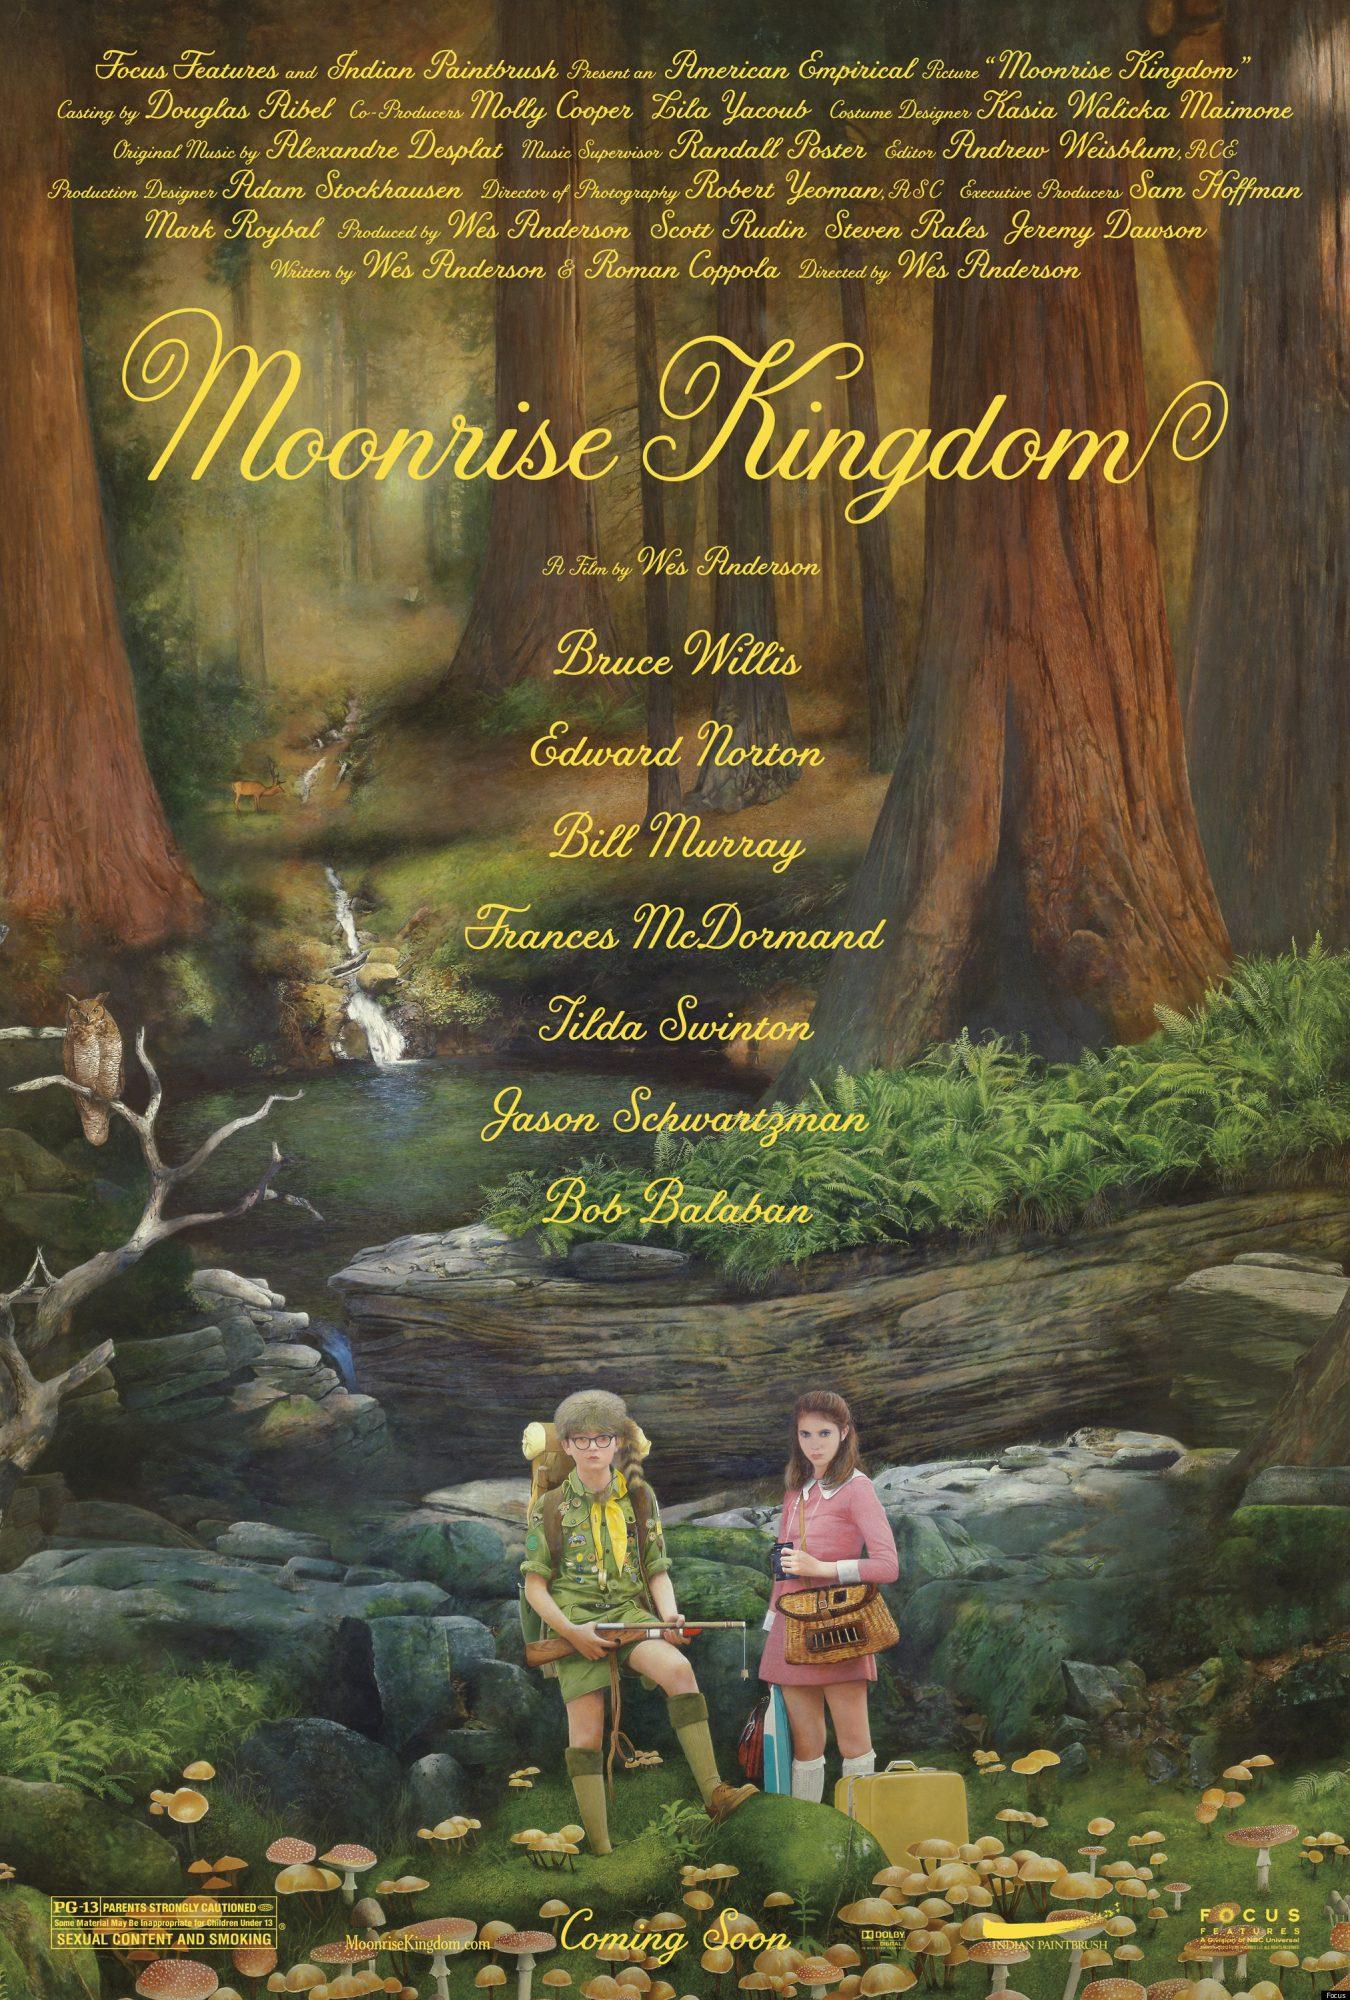 moonrise-kingdom-poster1.jpg